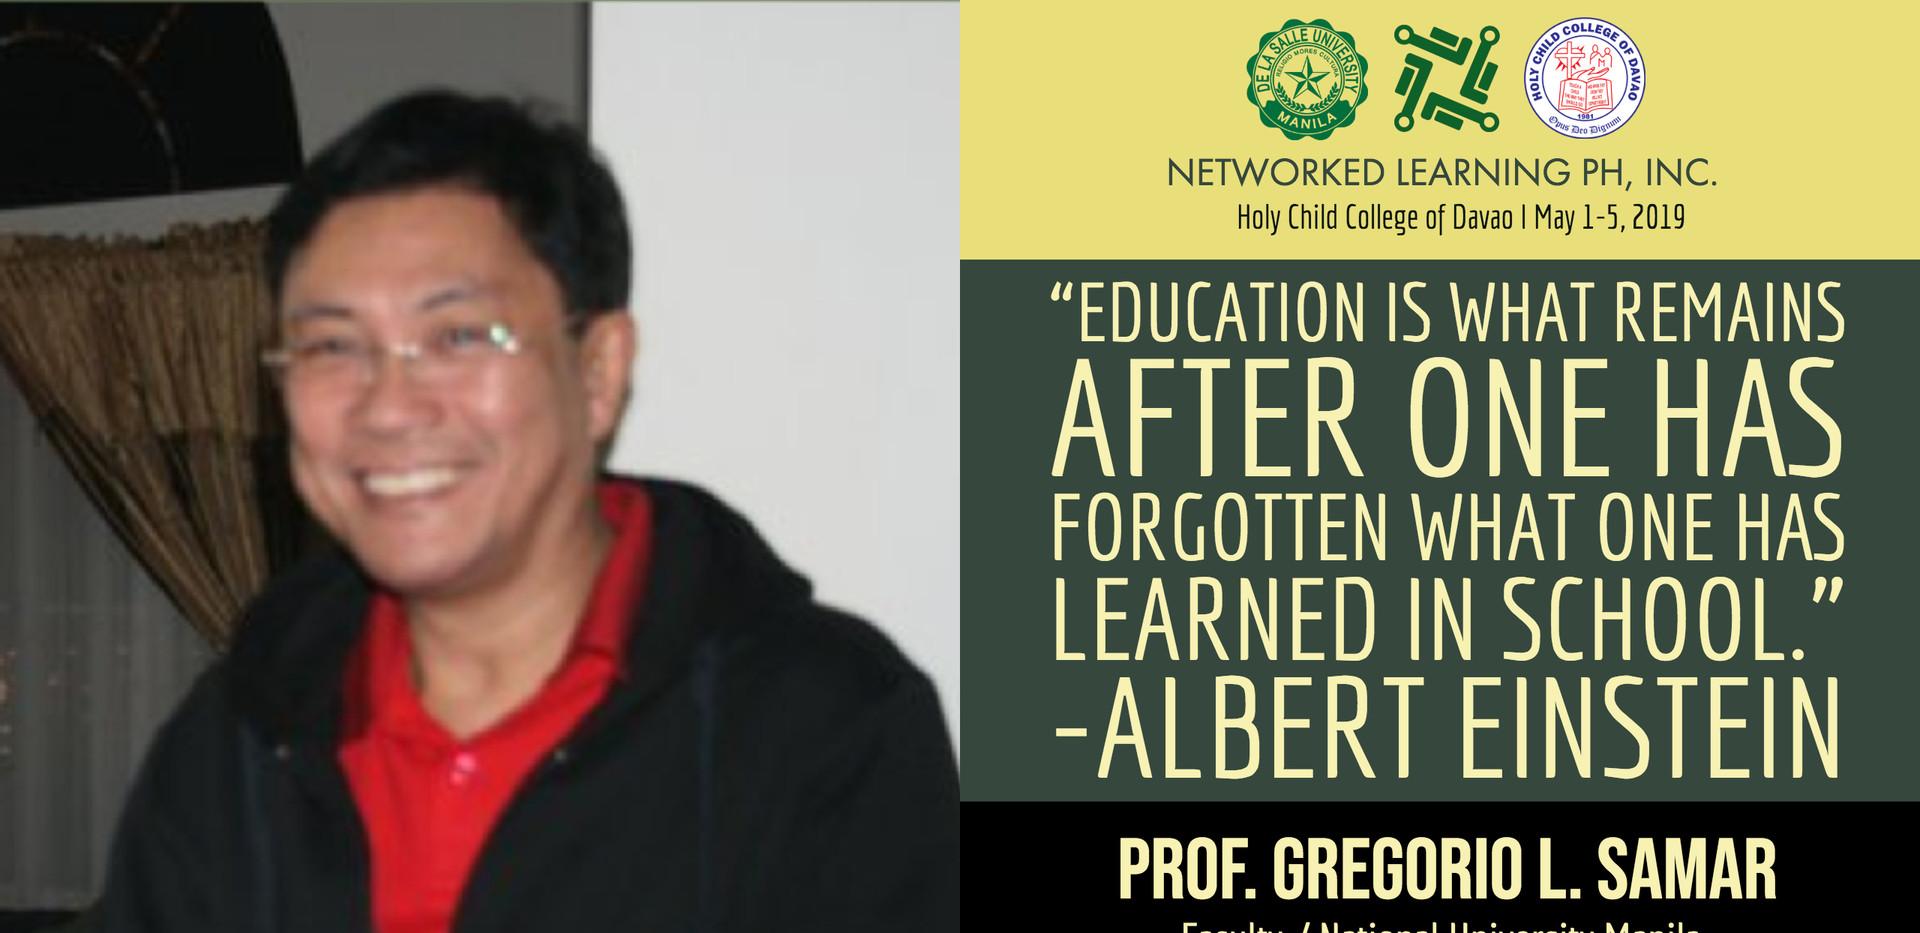 Prof. Gregorio L. Samar